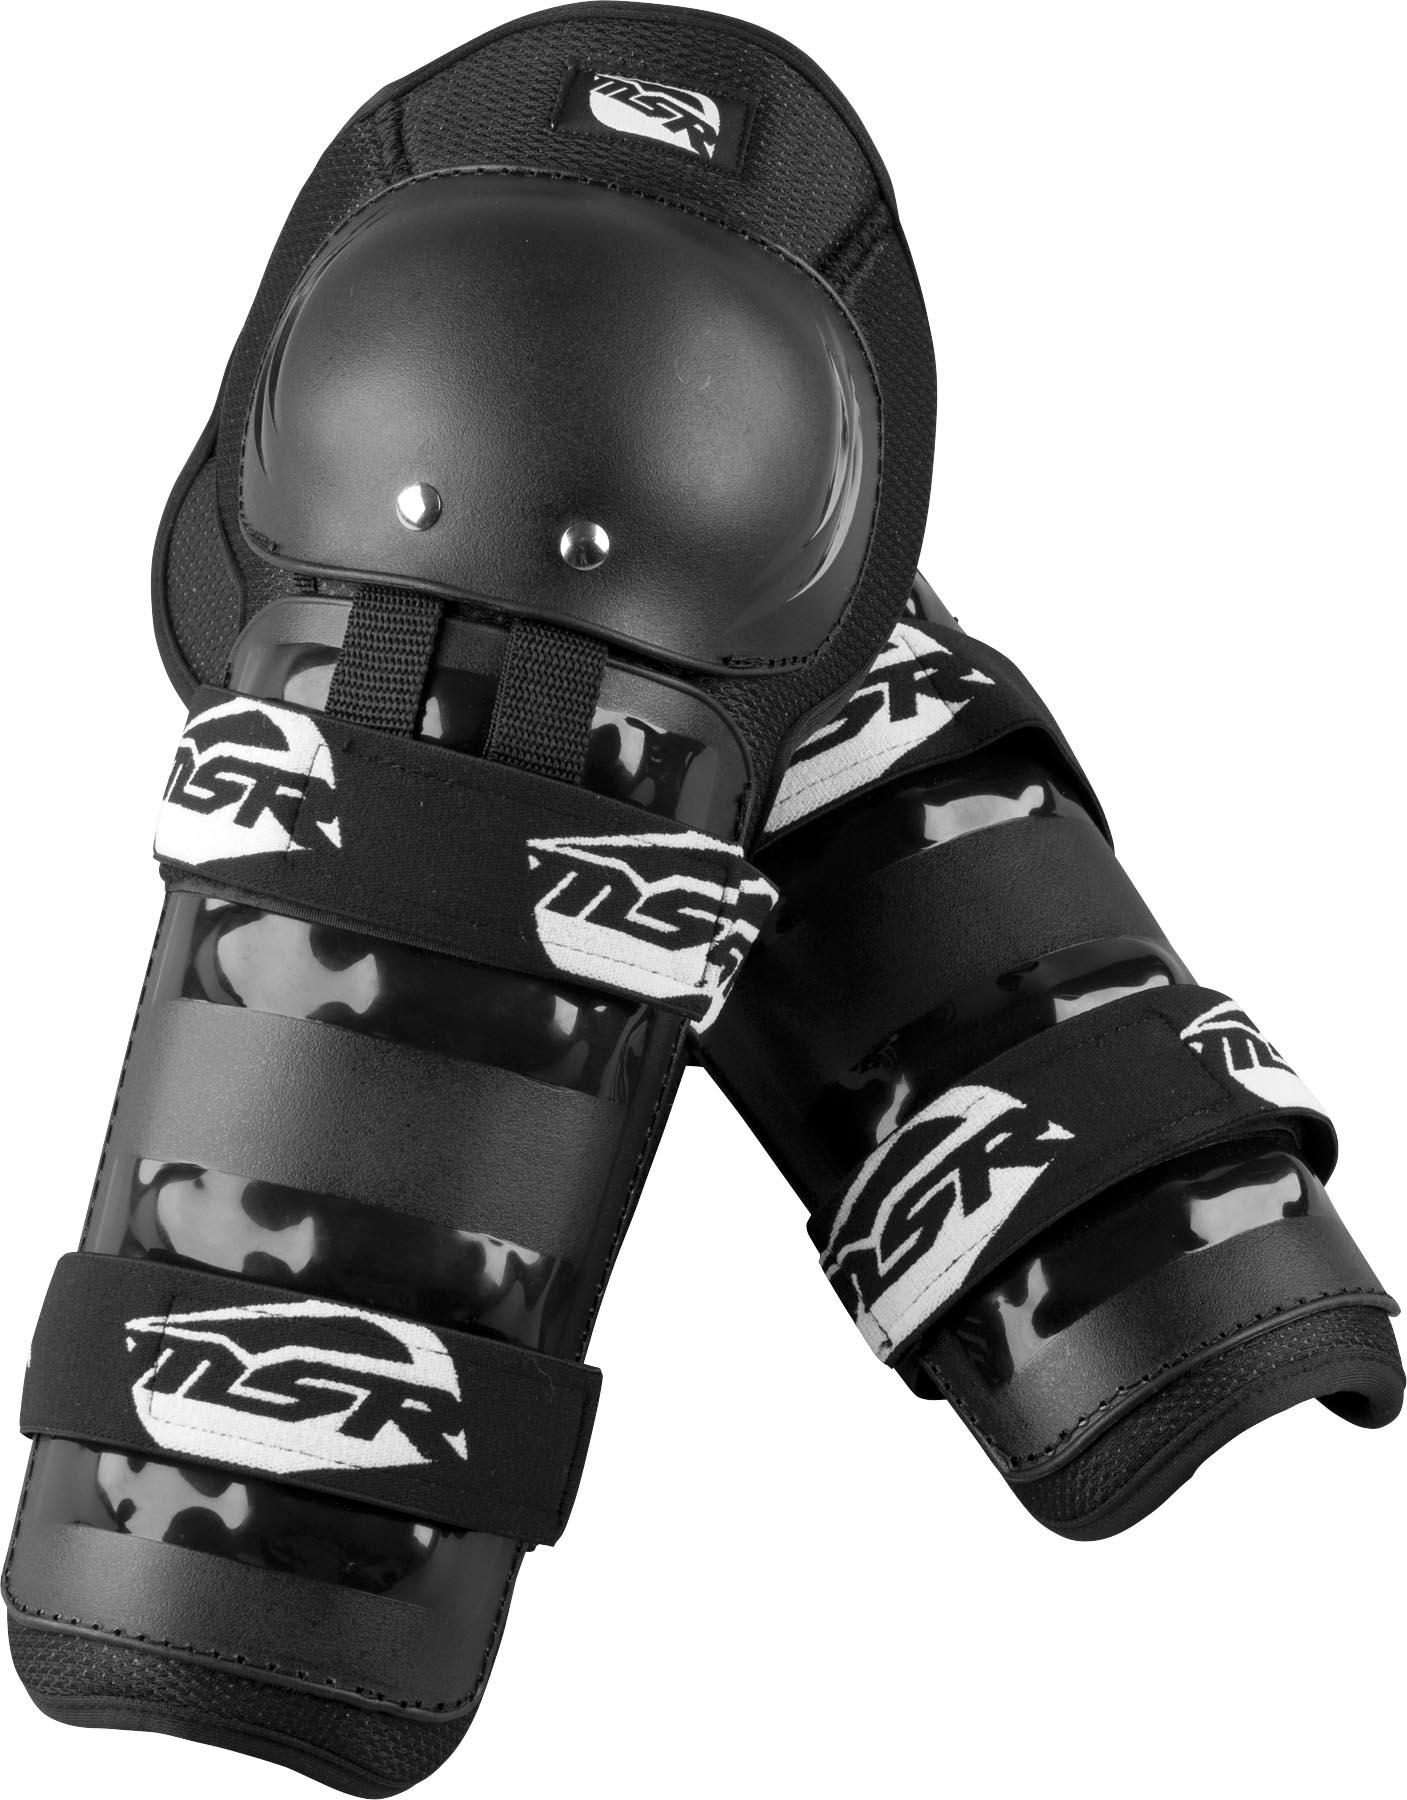 MSR Gravity Knee/Shin Guard